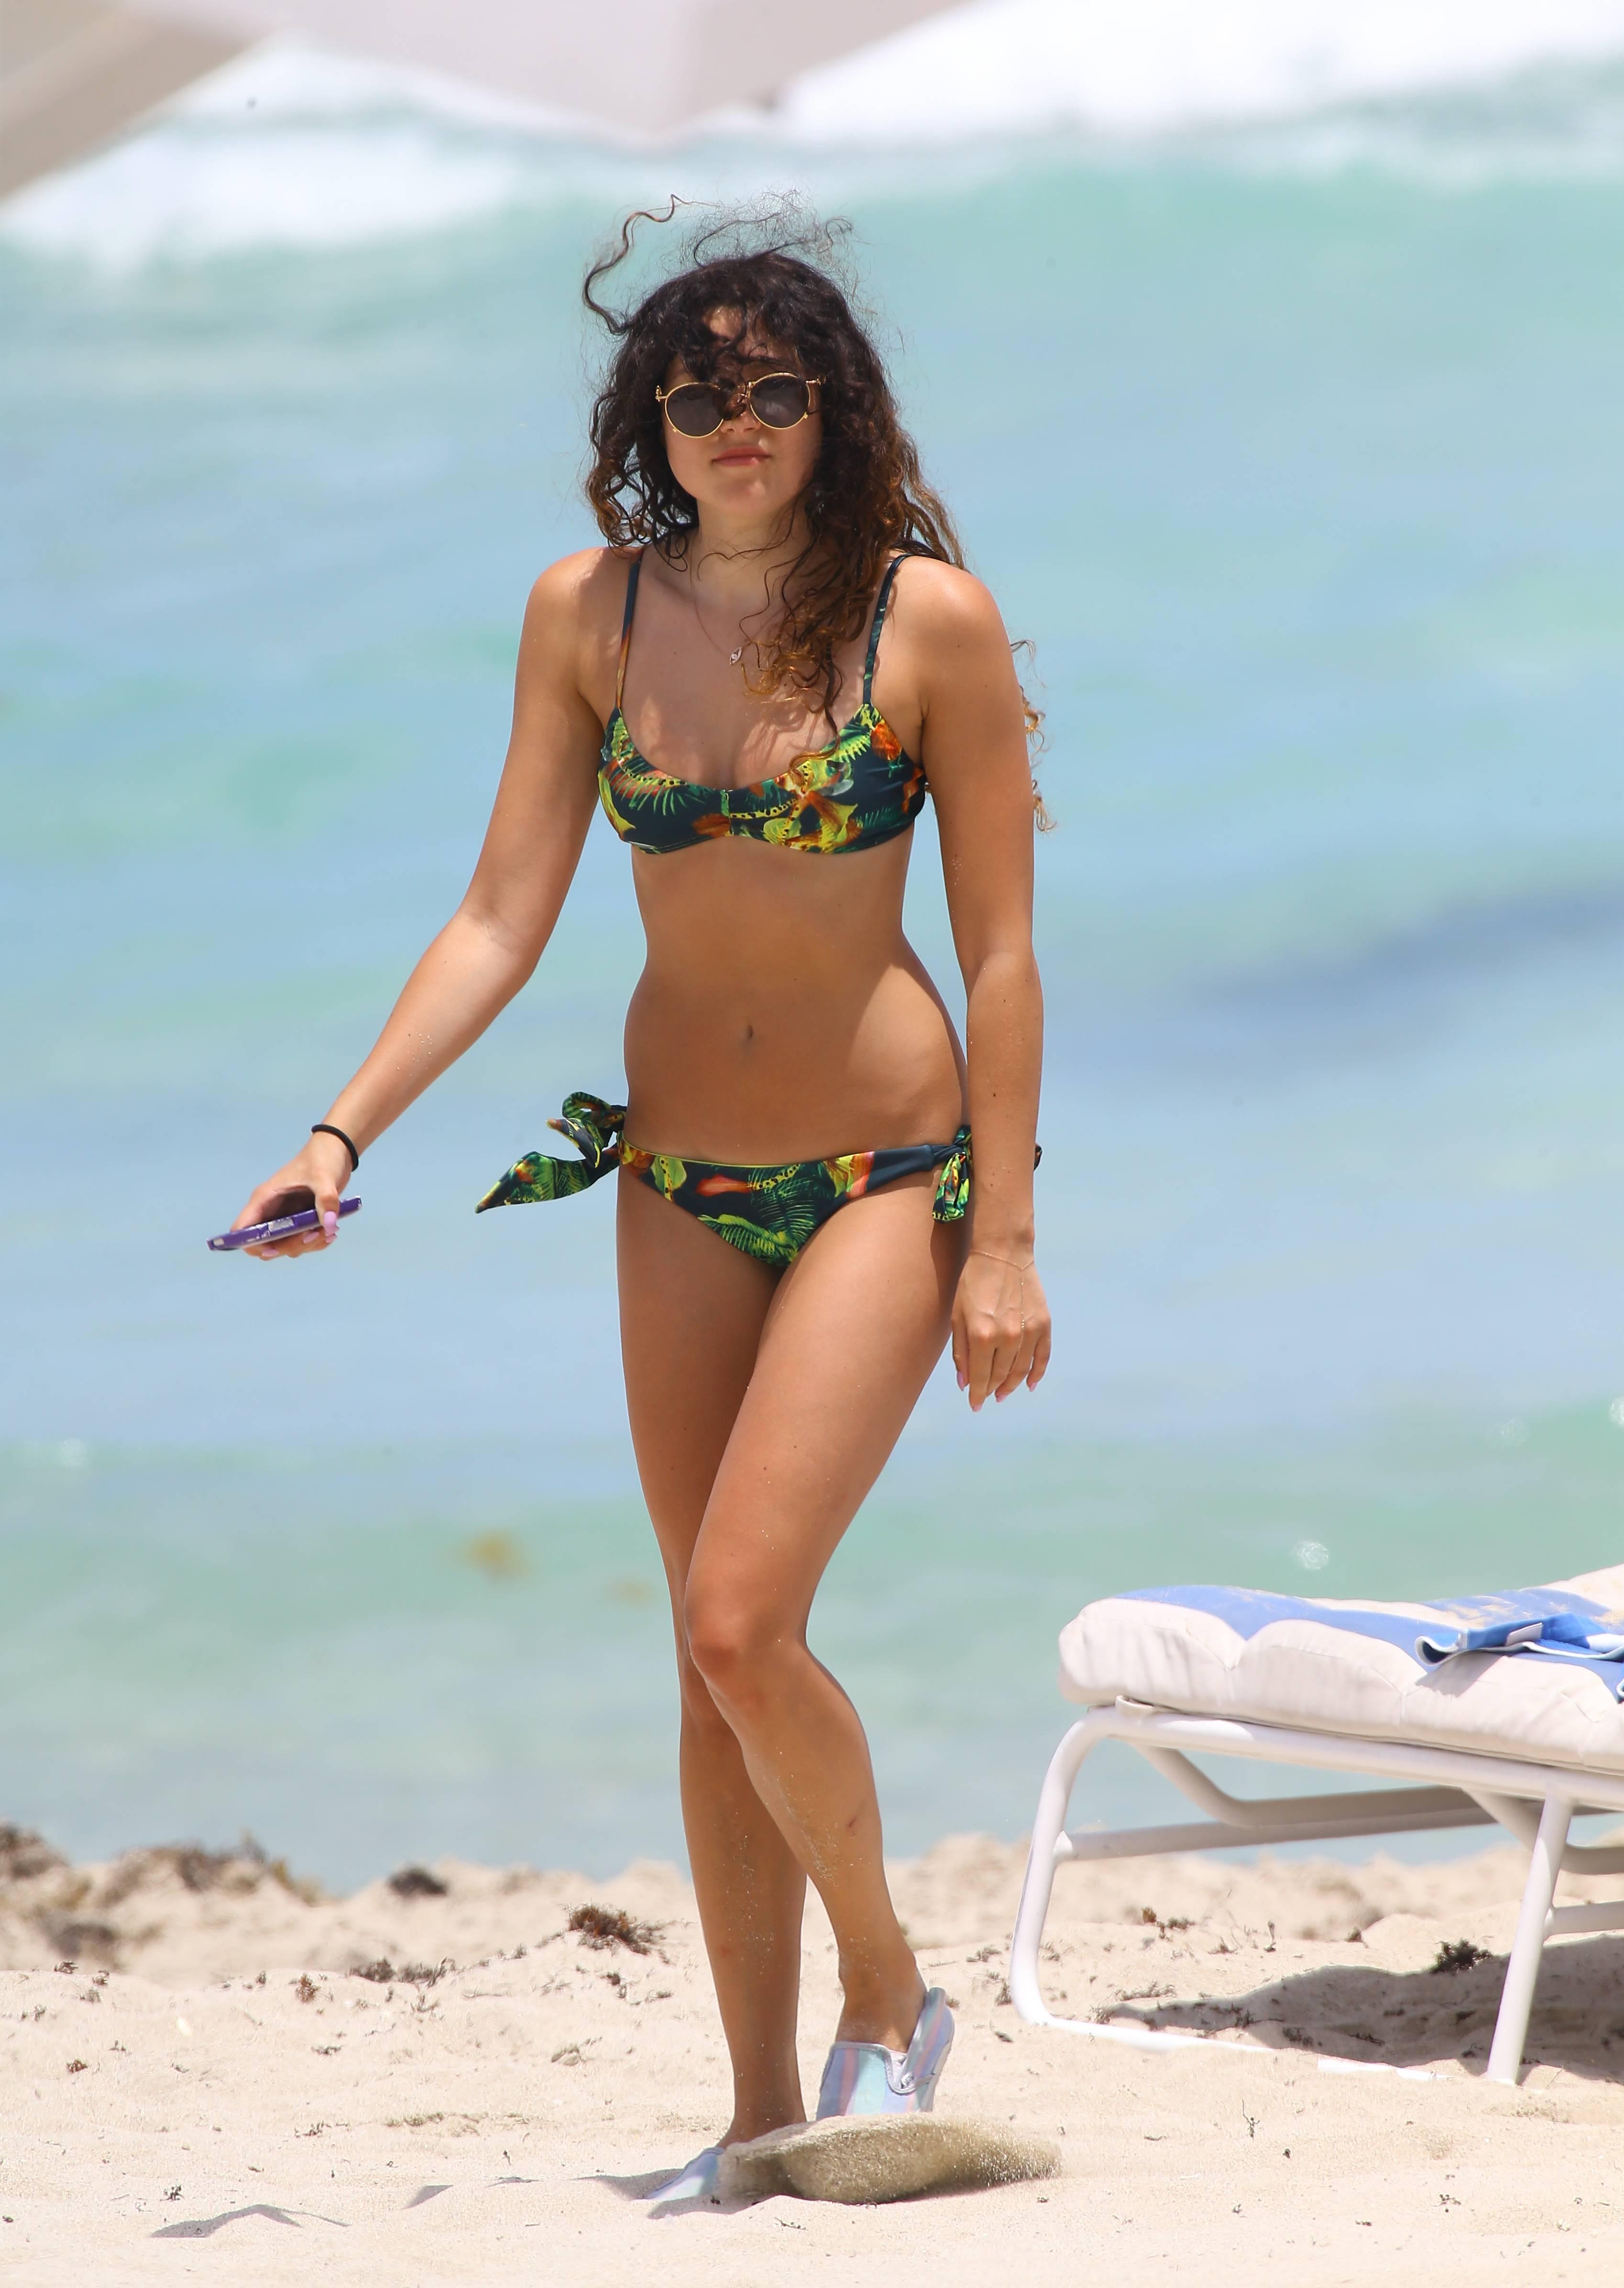 Bikini Eliza Doolittle nudes (94 photos), Ass, Hot, Feet, cameltoe 2017